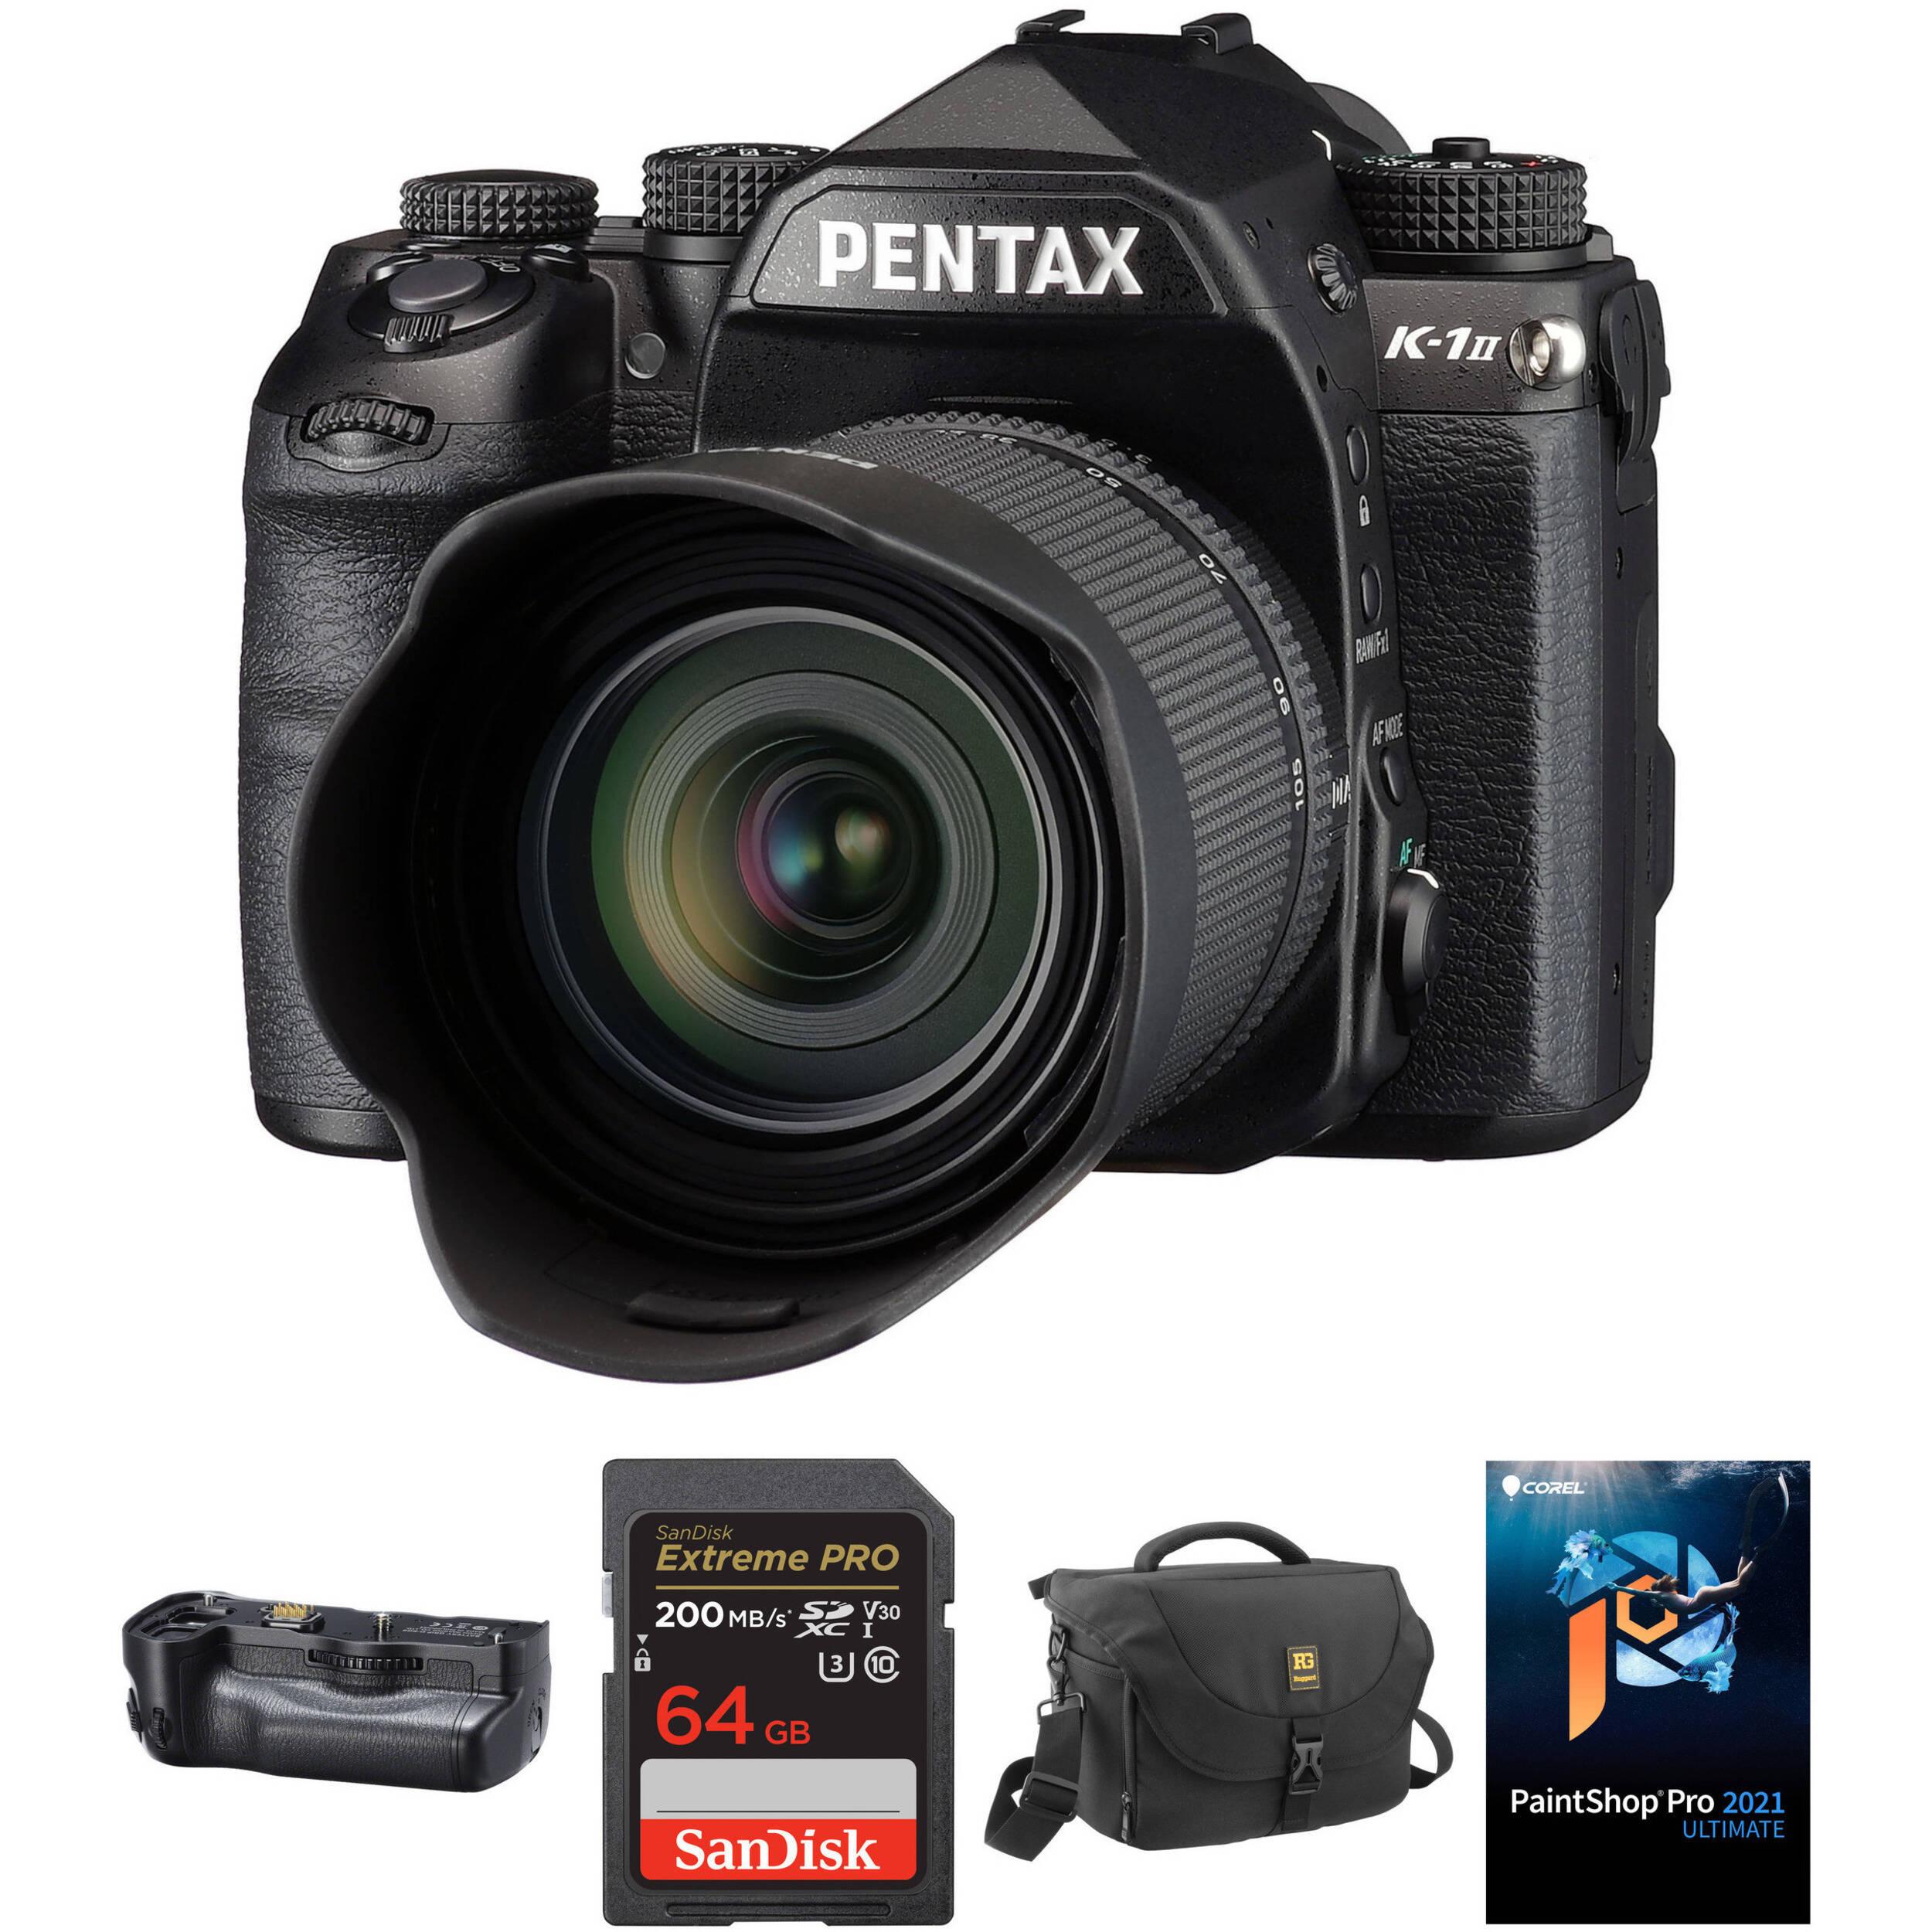 HDC-SDT750K Camcorder HDC-SD700K LCD USB Battery Charger for Panasonic HDC-SD600K